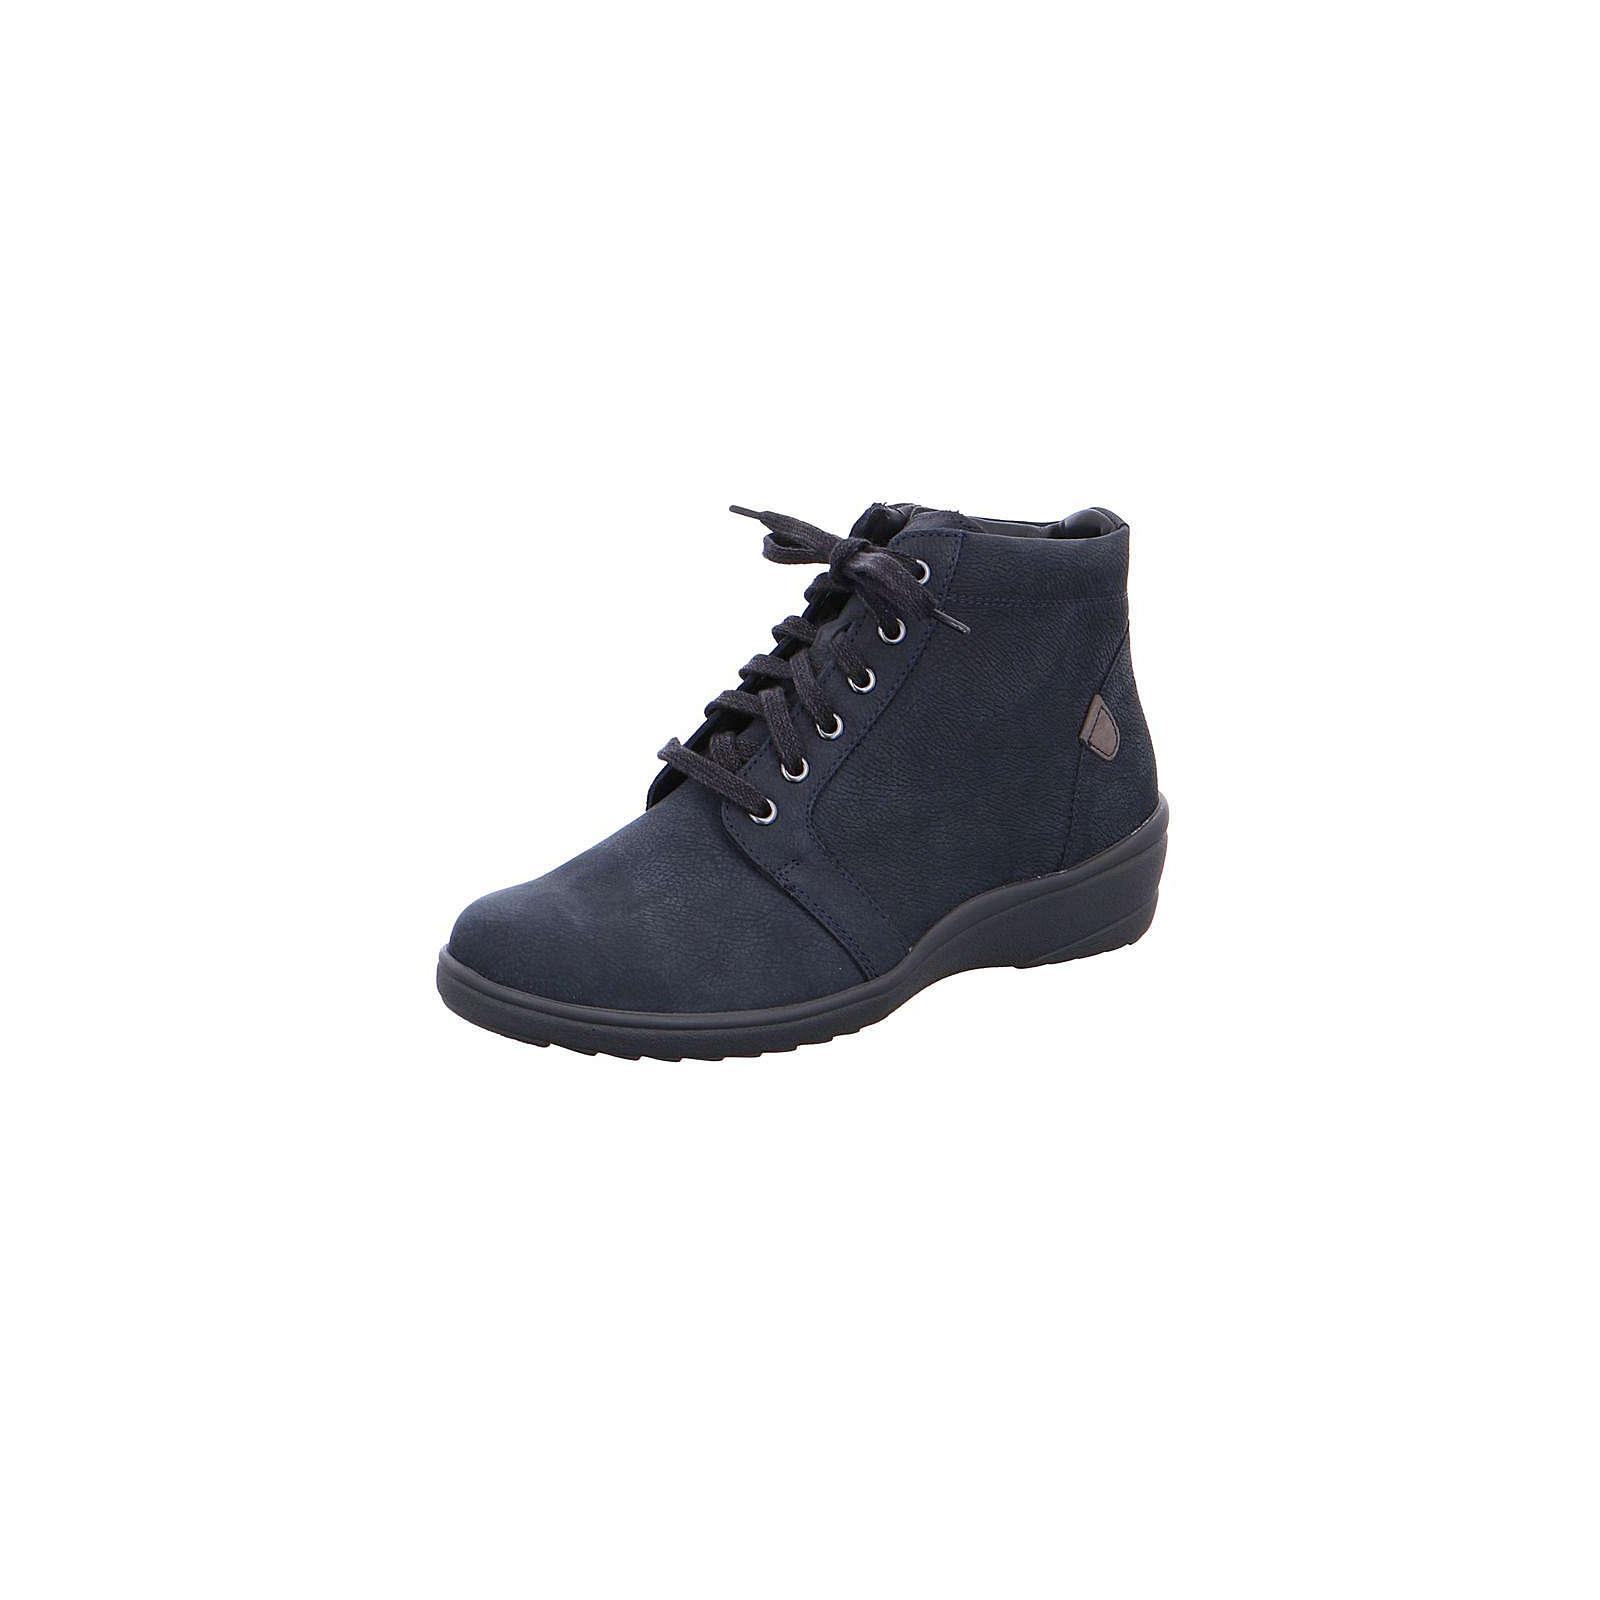 Ganter Stiefel dunkel-blau dunkelblau Damen Gr. 37,5